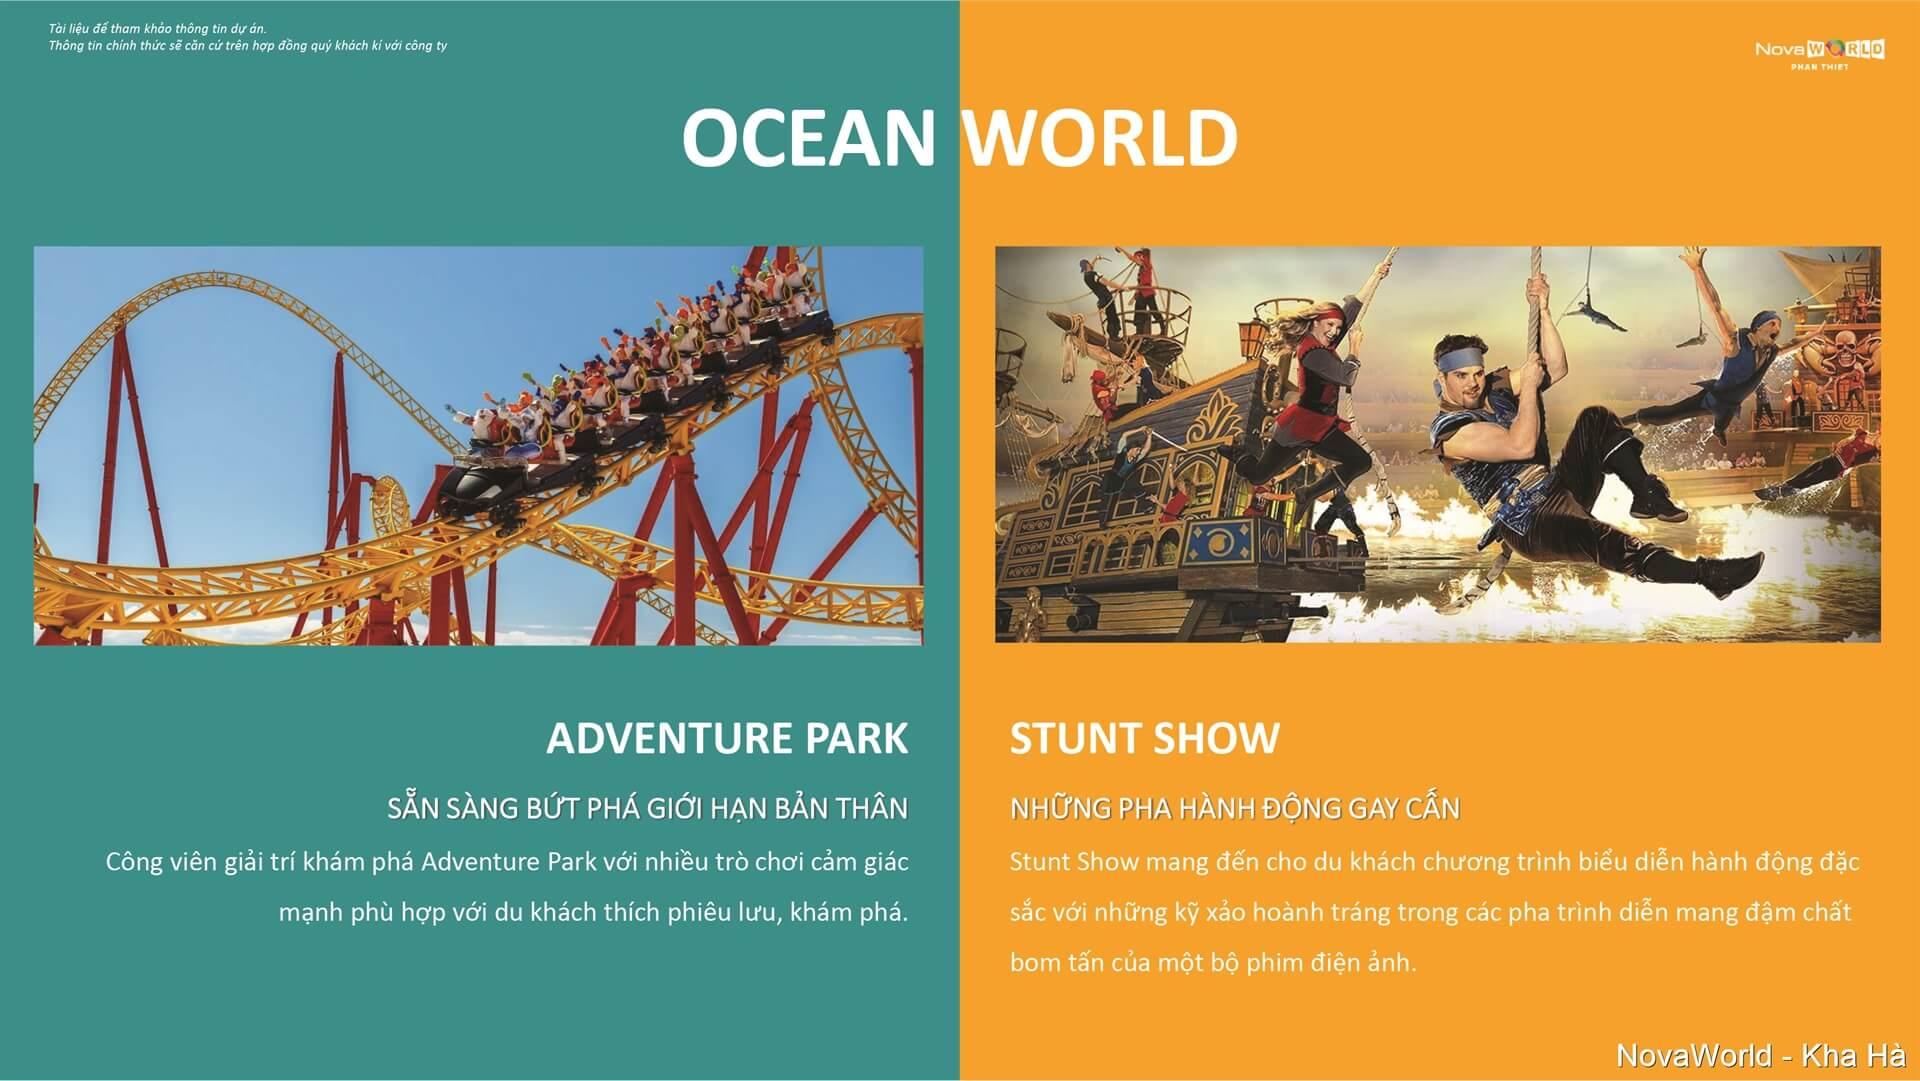 Ocean-World-cong-vien-giai-tri-mao-hiem-cuop-bien-25ha